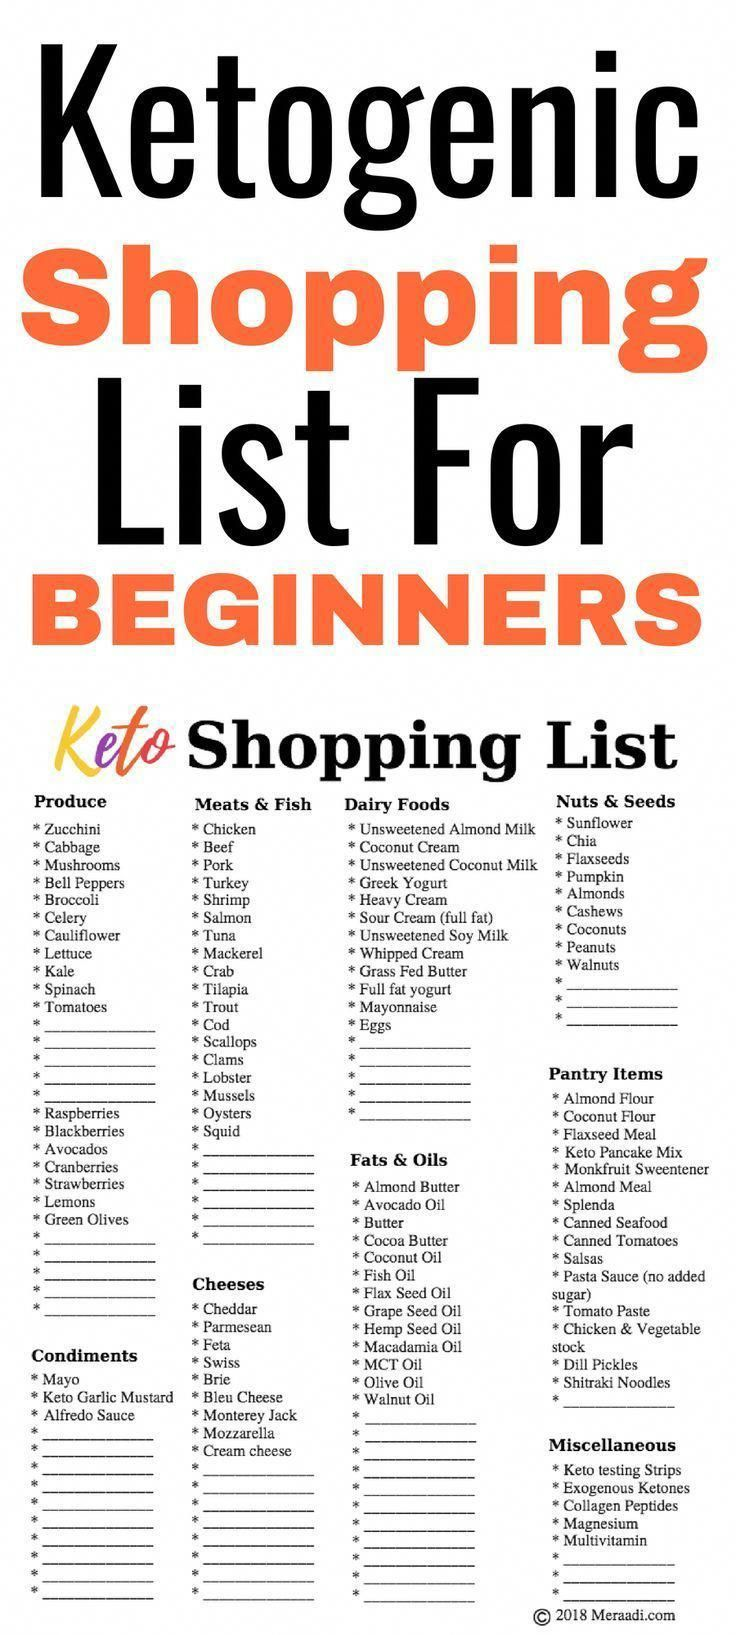 Lentil Salad With Fourme D Ambert Healthy Food Mom Recipe Keto Diet Food List Keto Diet Recipes Keto Shopping List